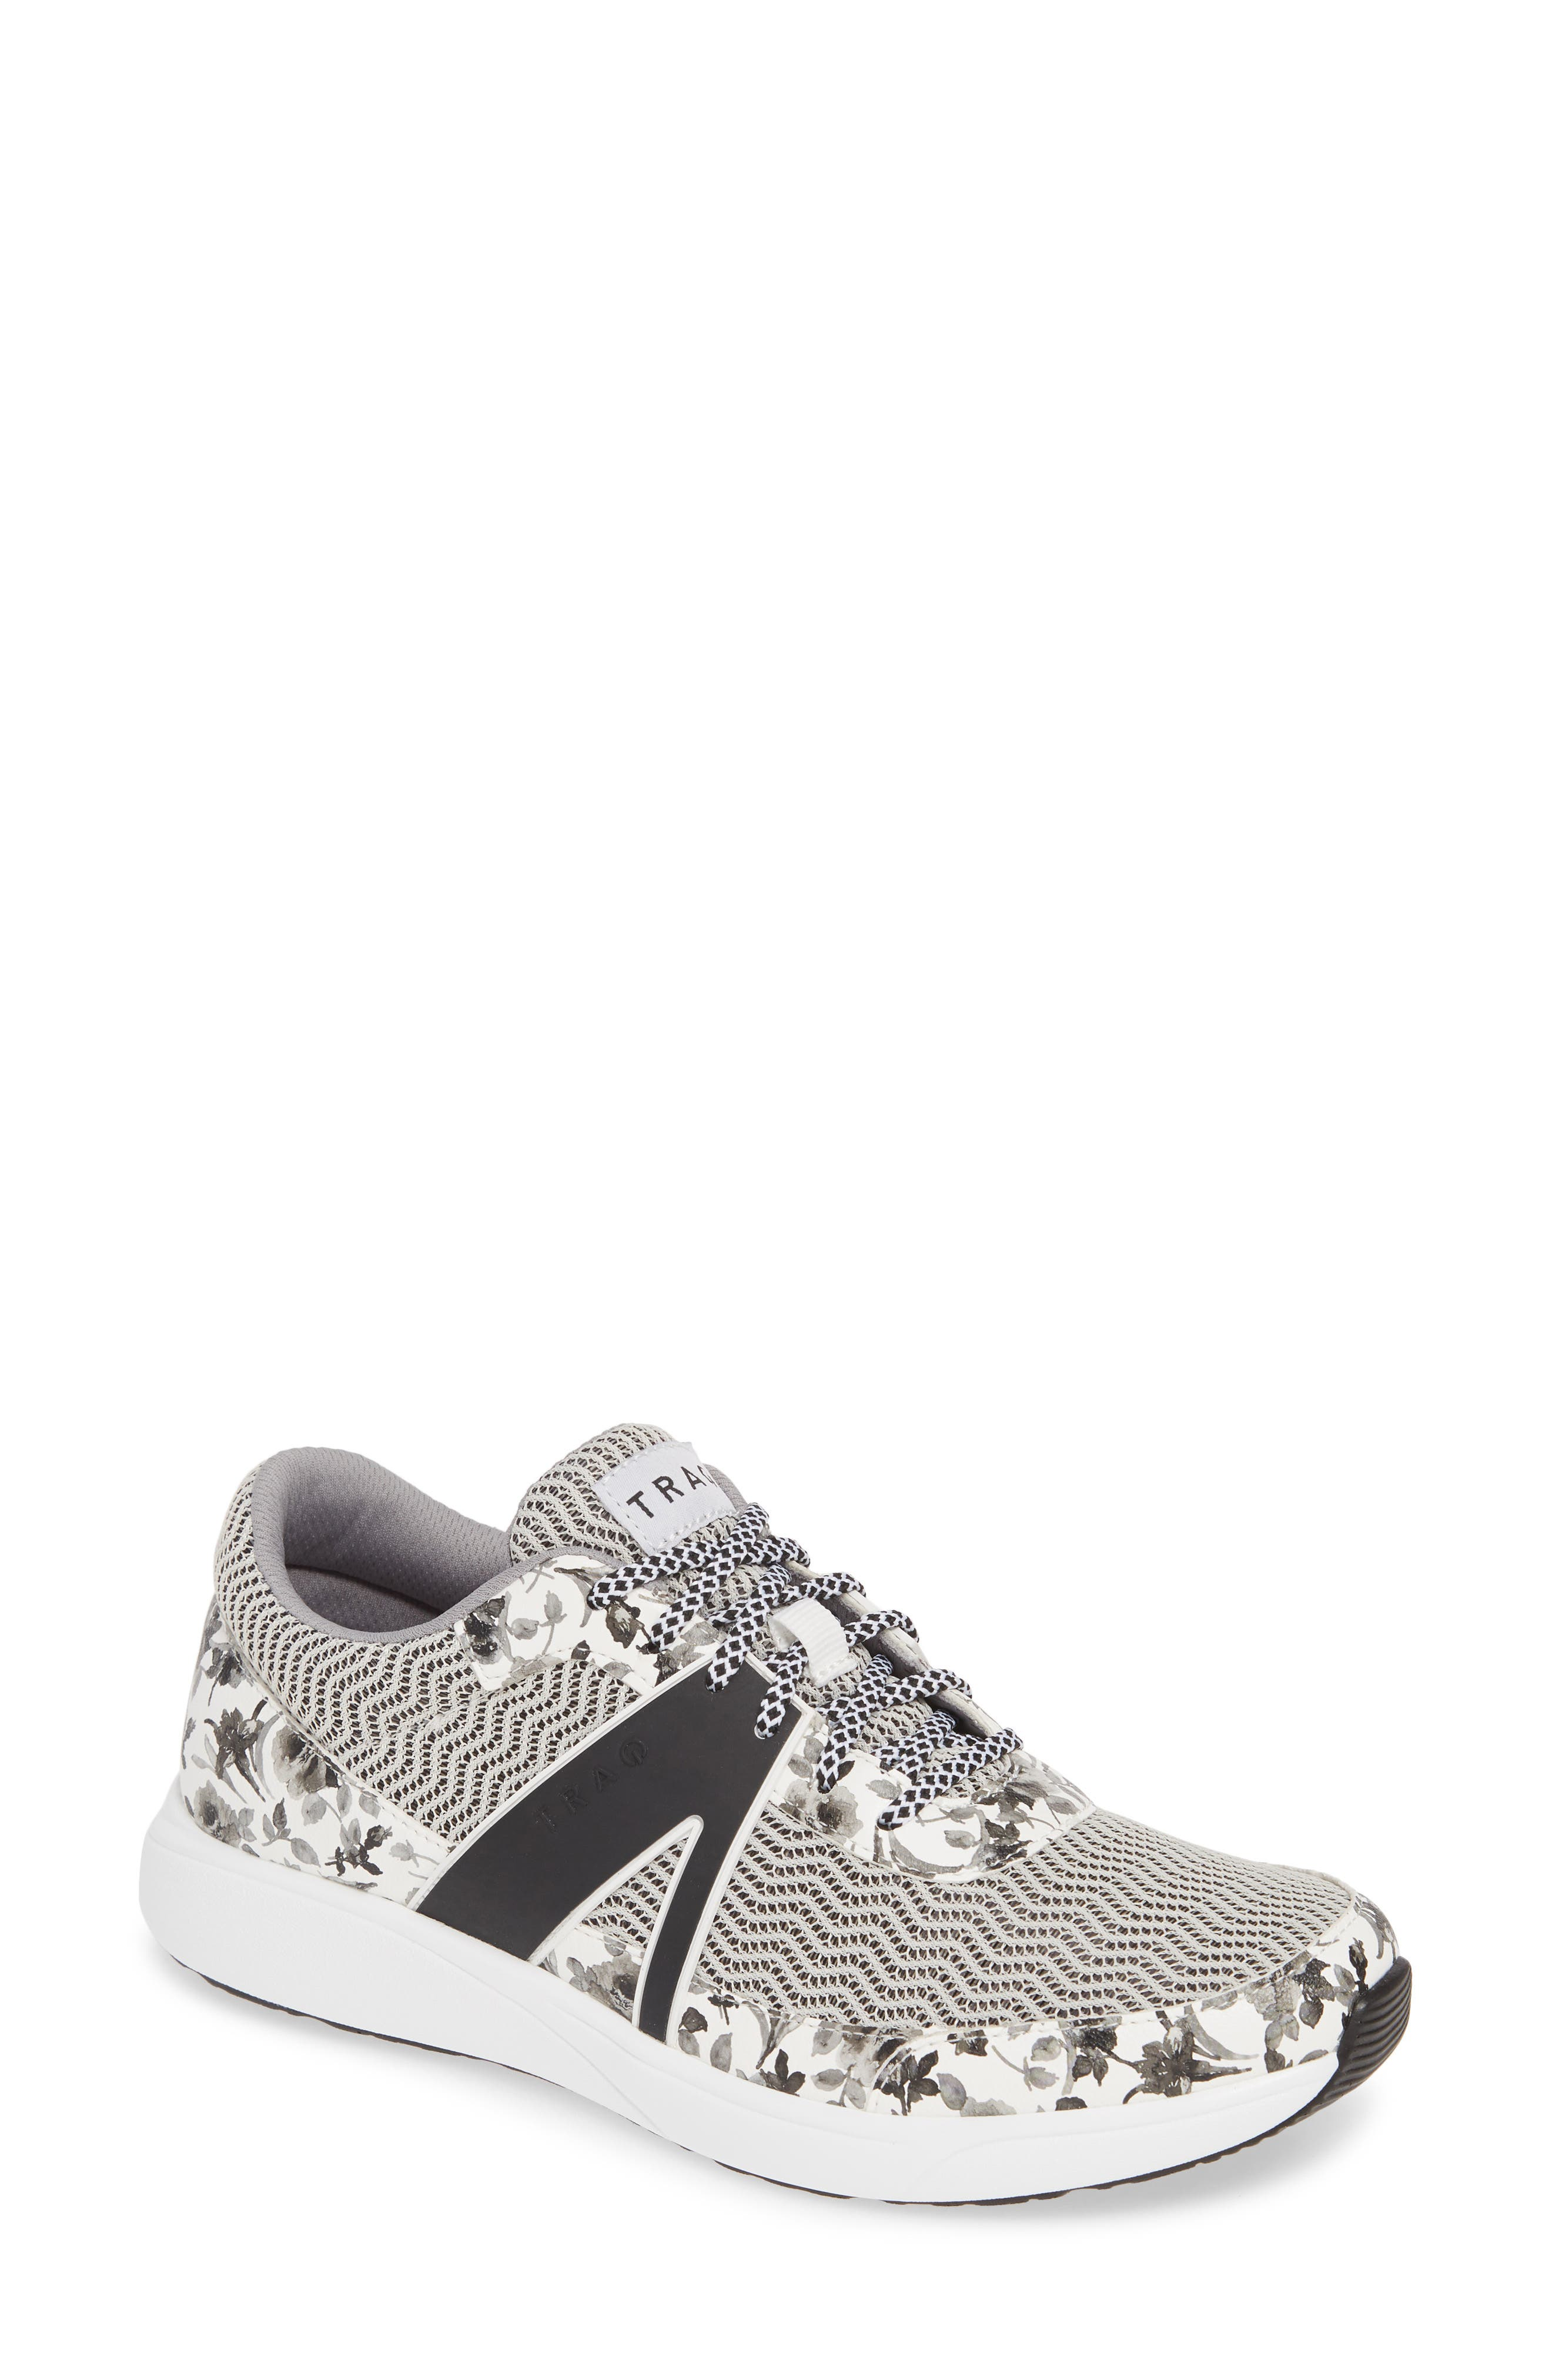 Alegria Qarma Sneaker, Grey